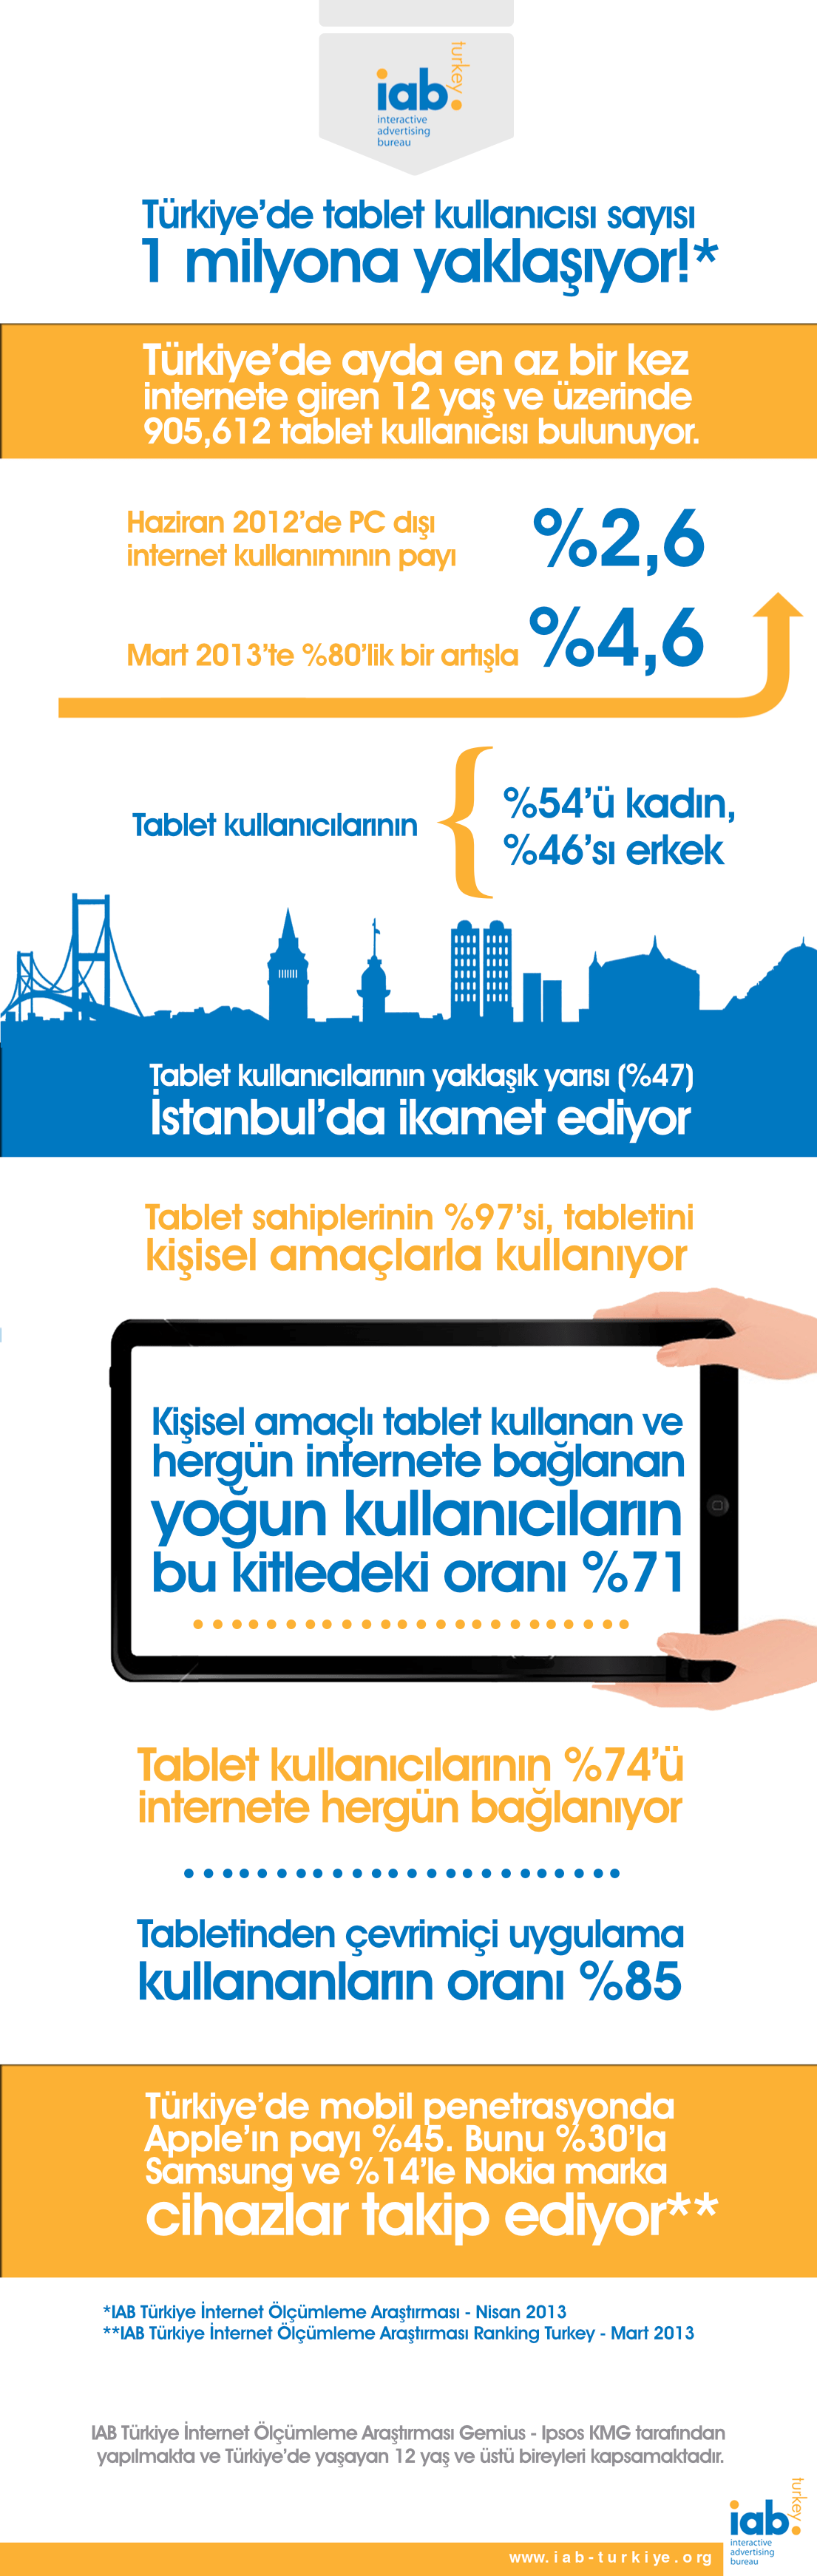 iab_infografik